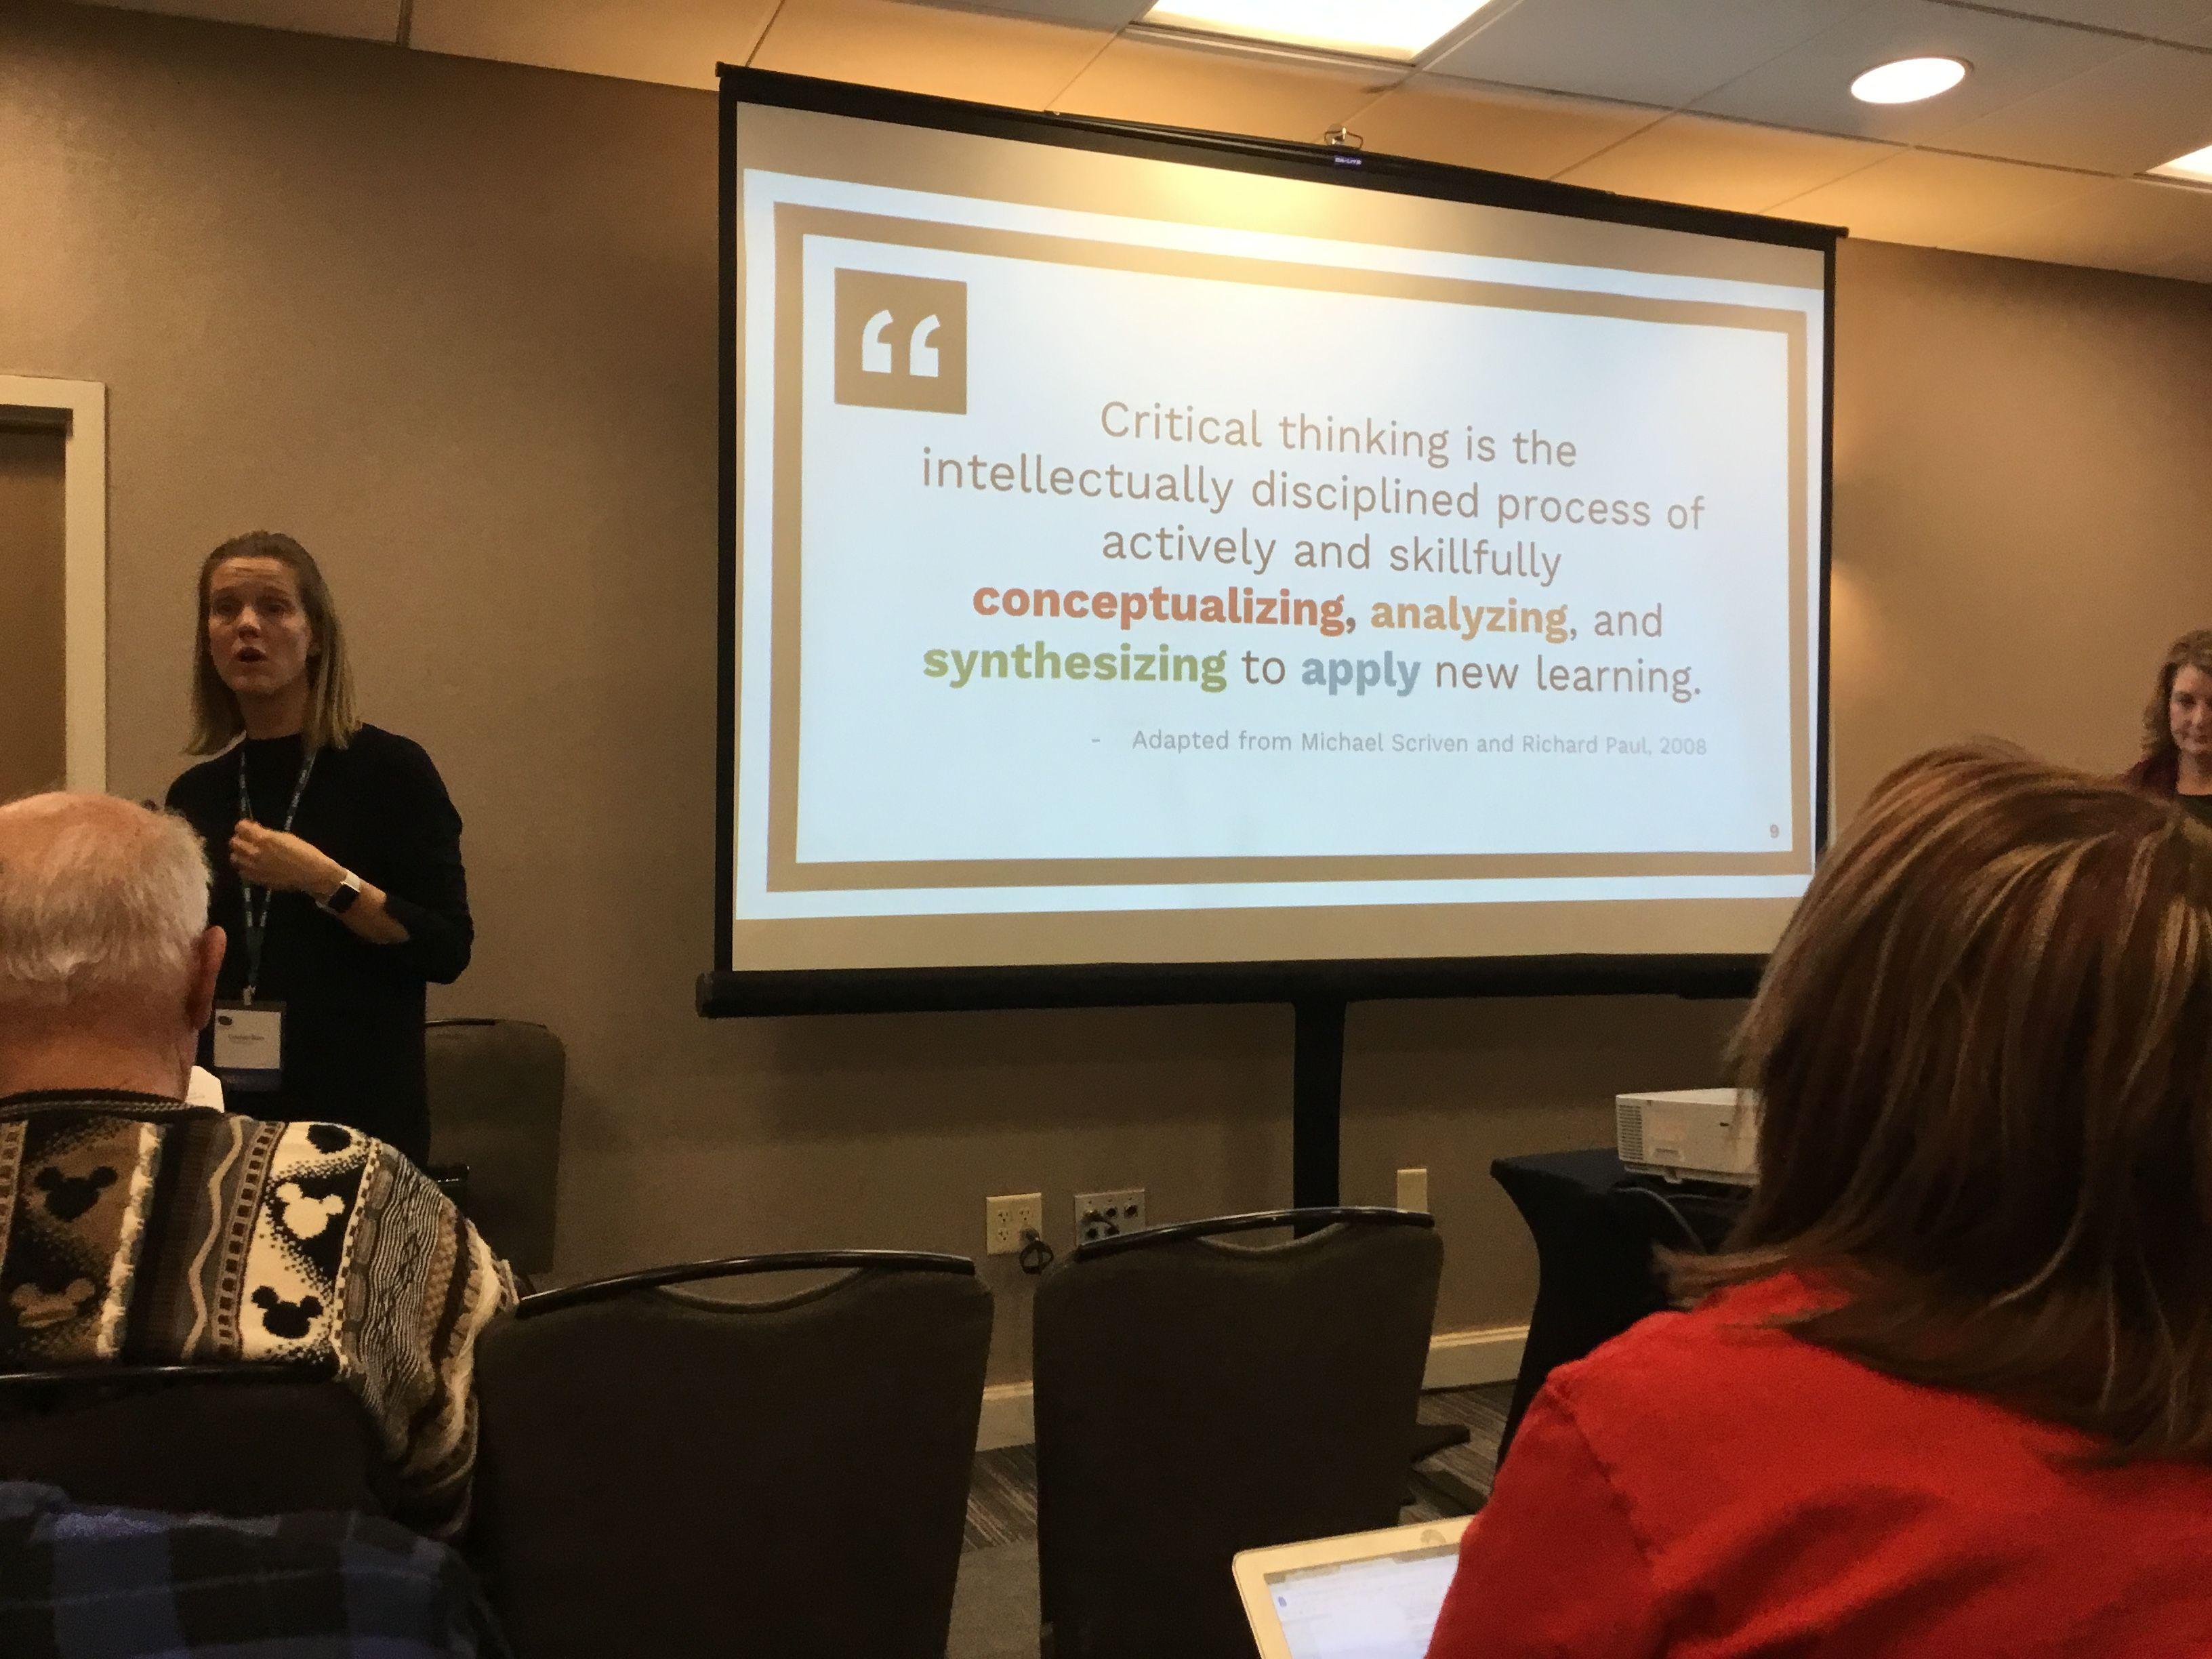 Pin by JoAnn Moran on Teaching Ideas Critical thinking